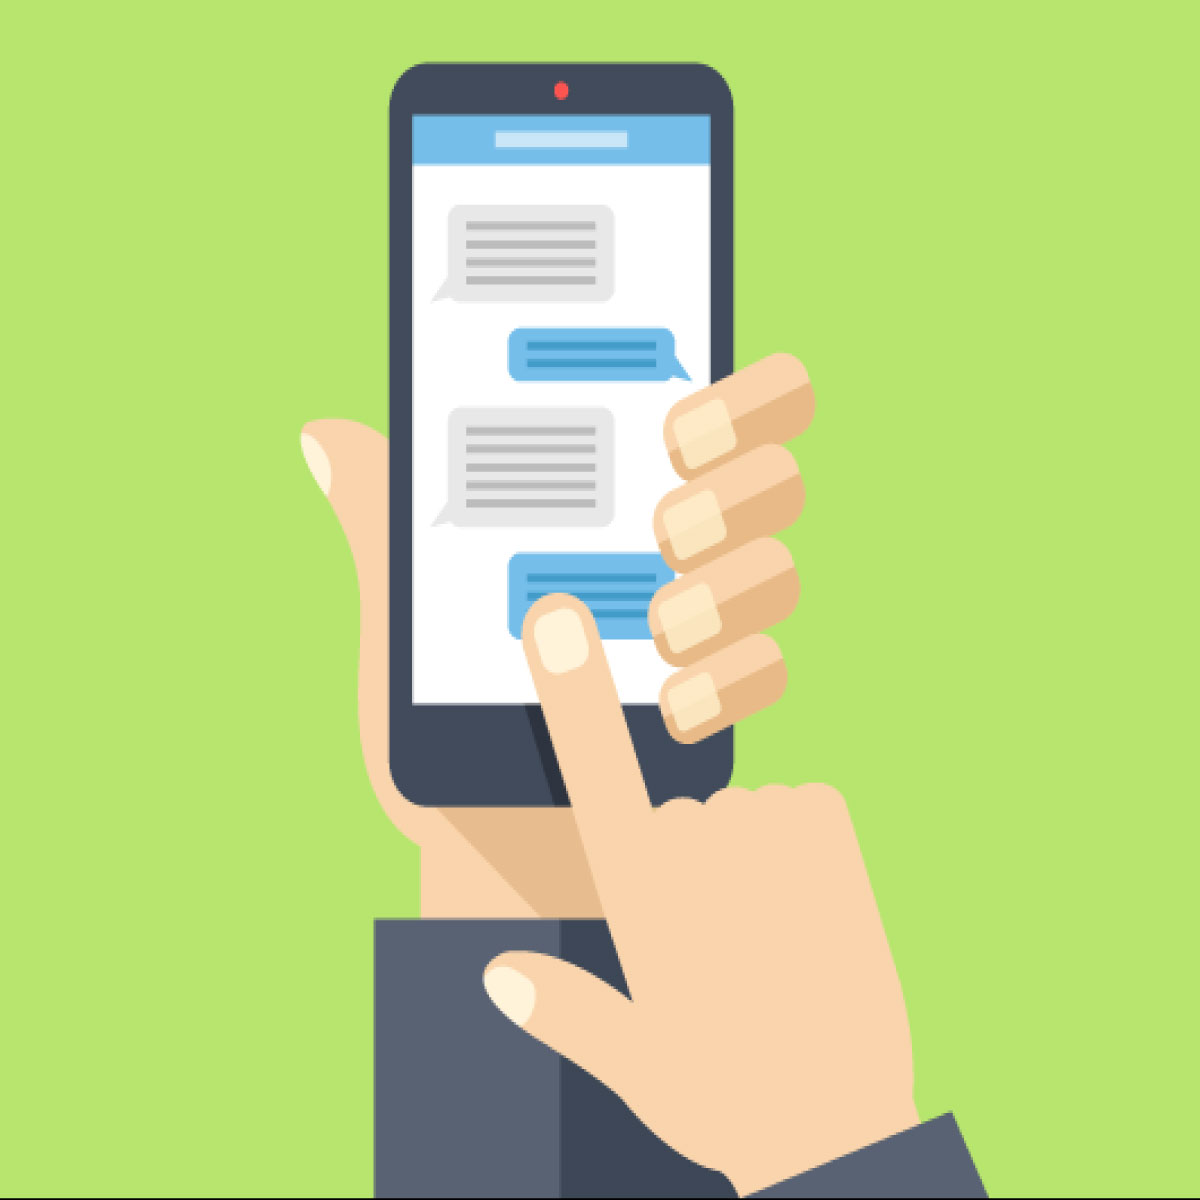 SMS Application using AES Algorithum